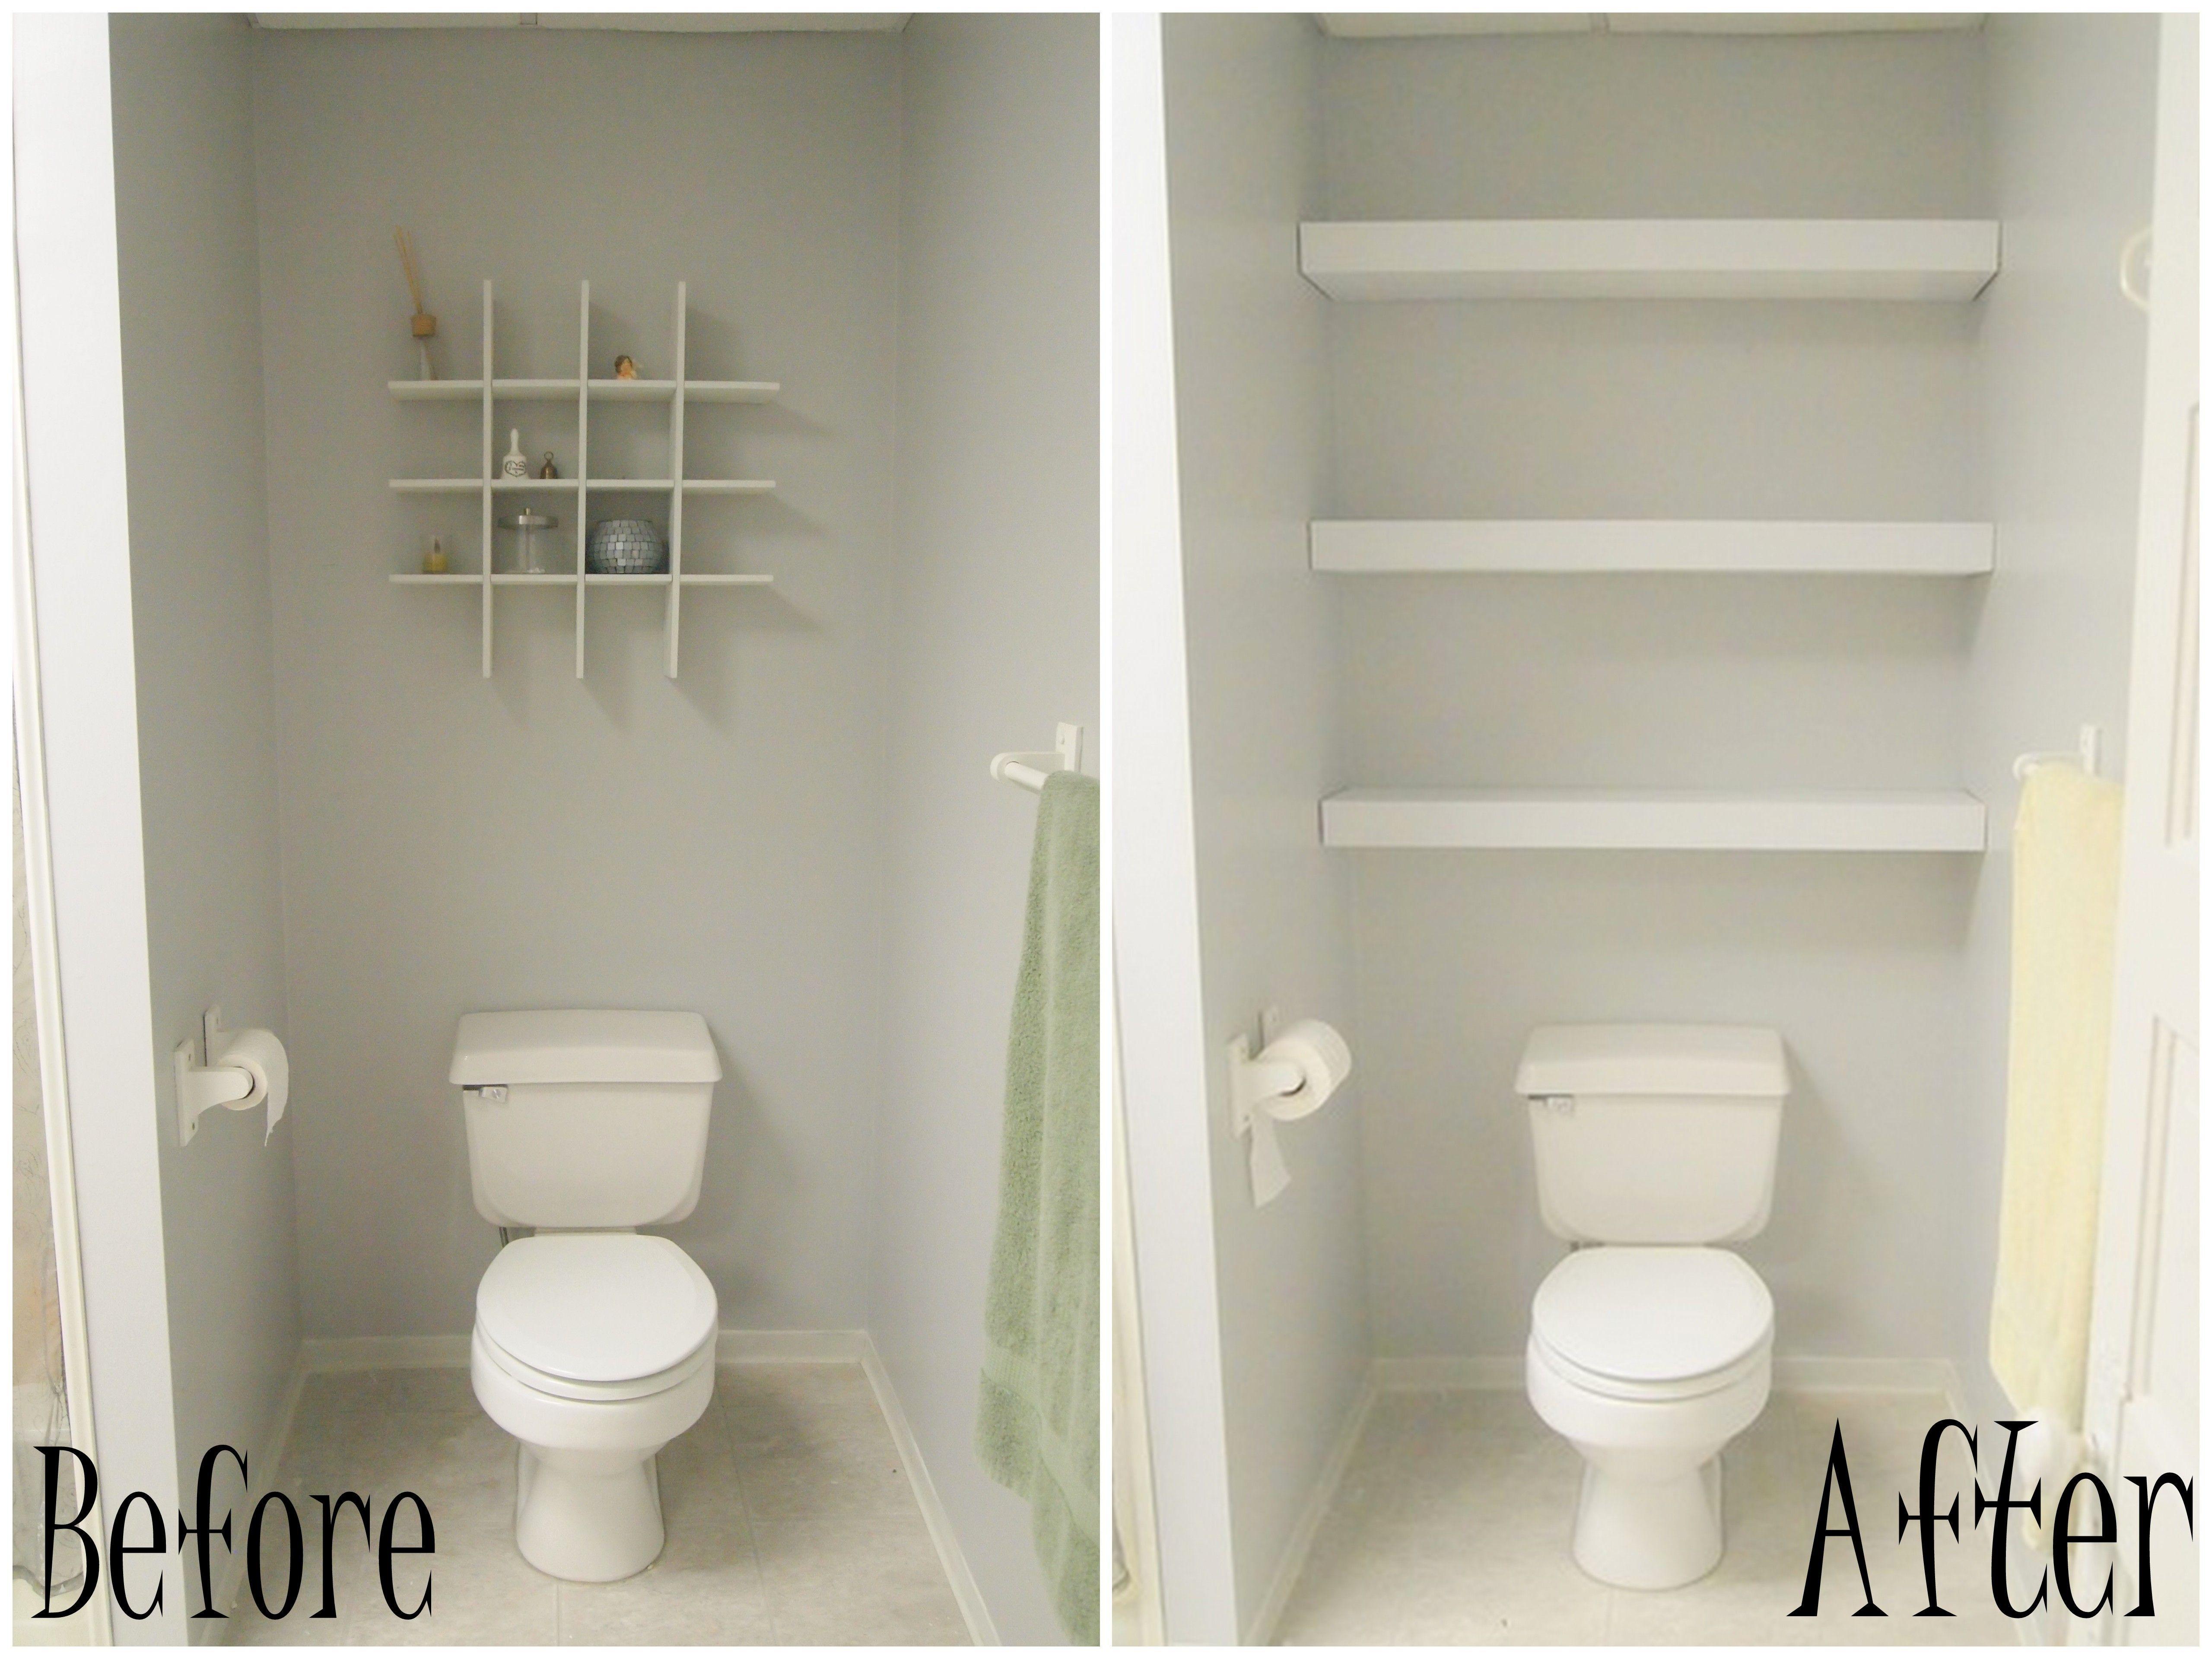 Bathroom Storage Over Toilet F3stl6zs Jpg 5120 3840 Over